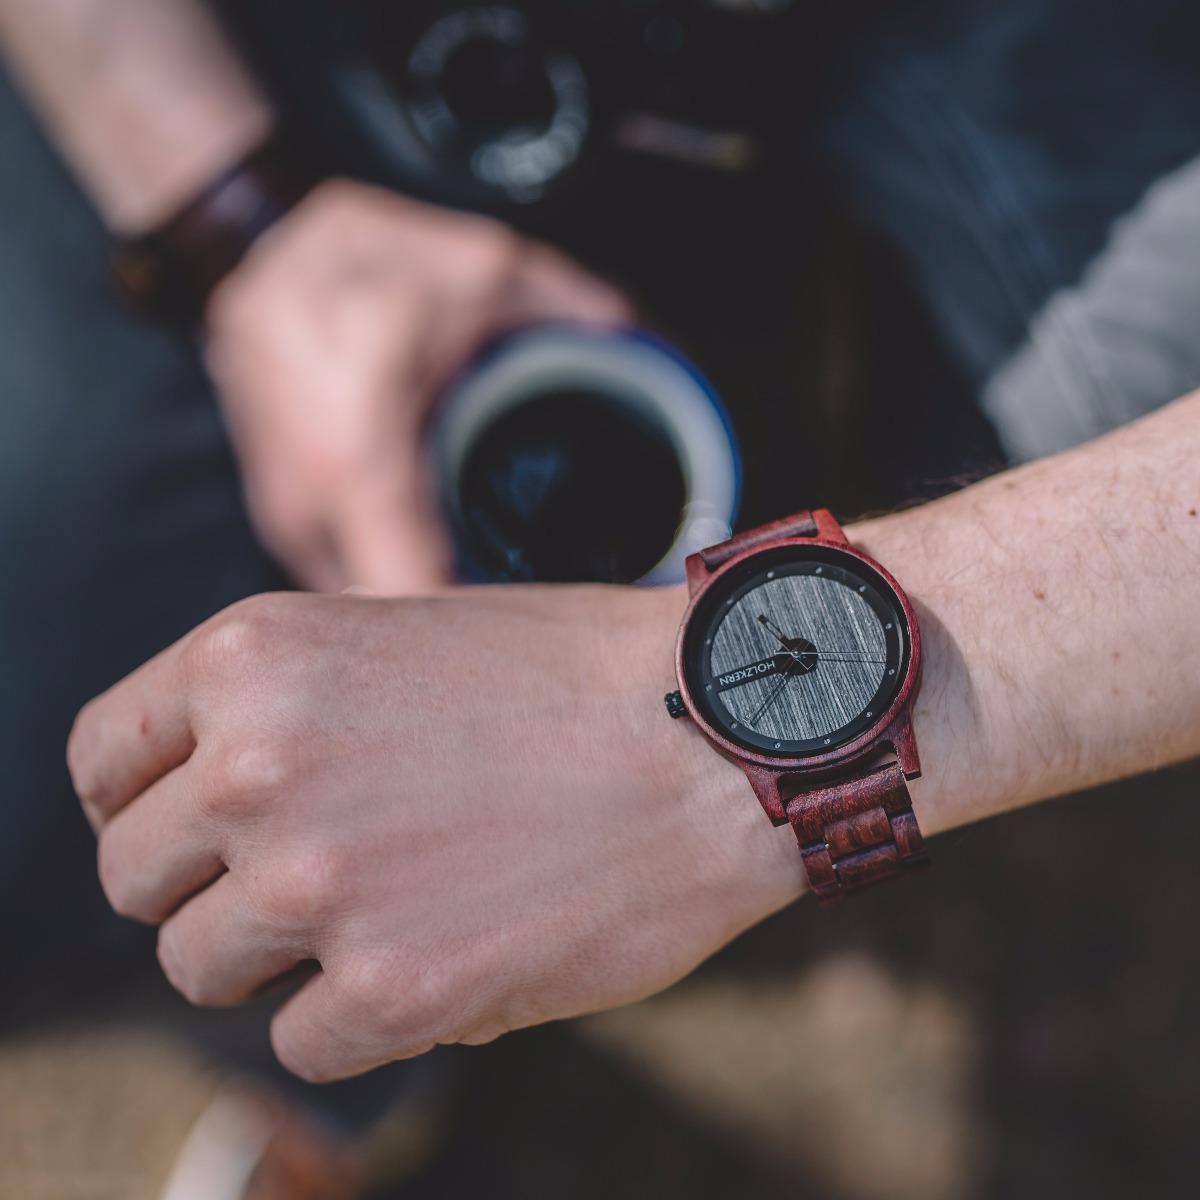 Wooden watch Matterhorn is a combination of grey and brown tones